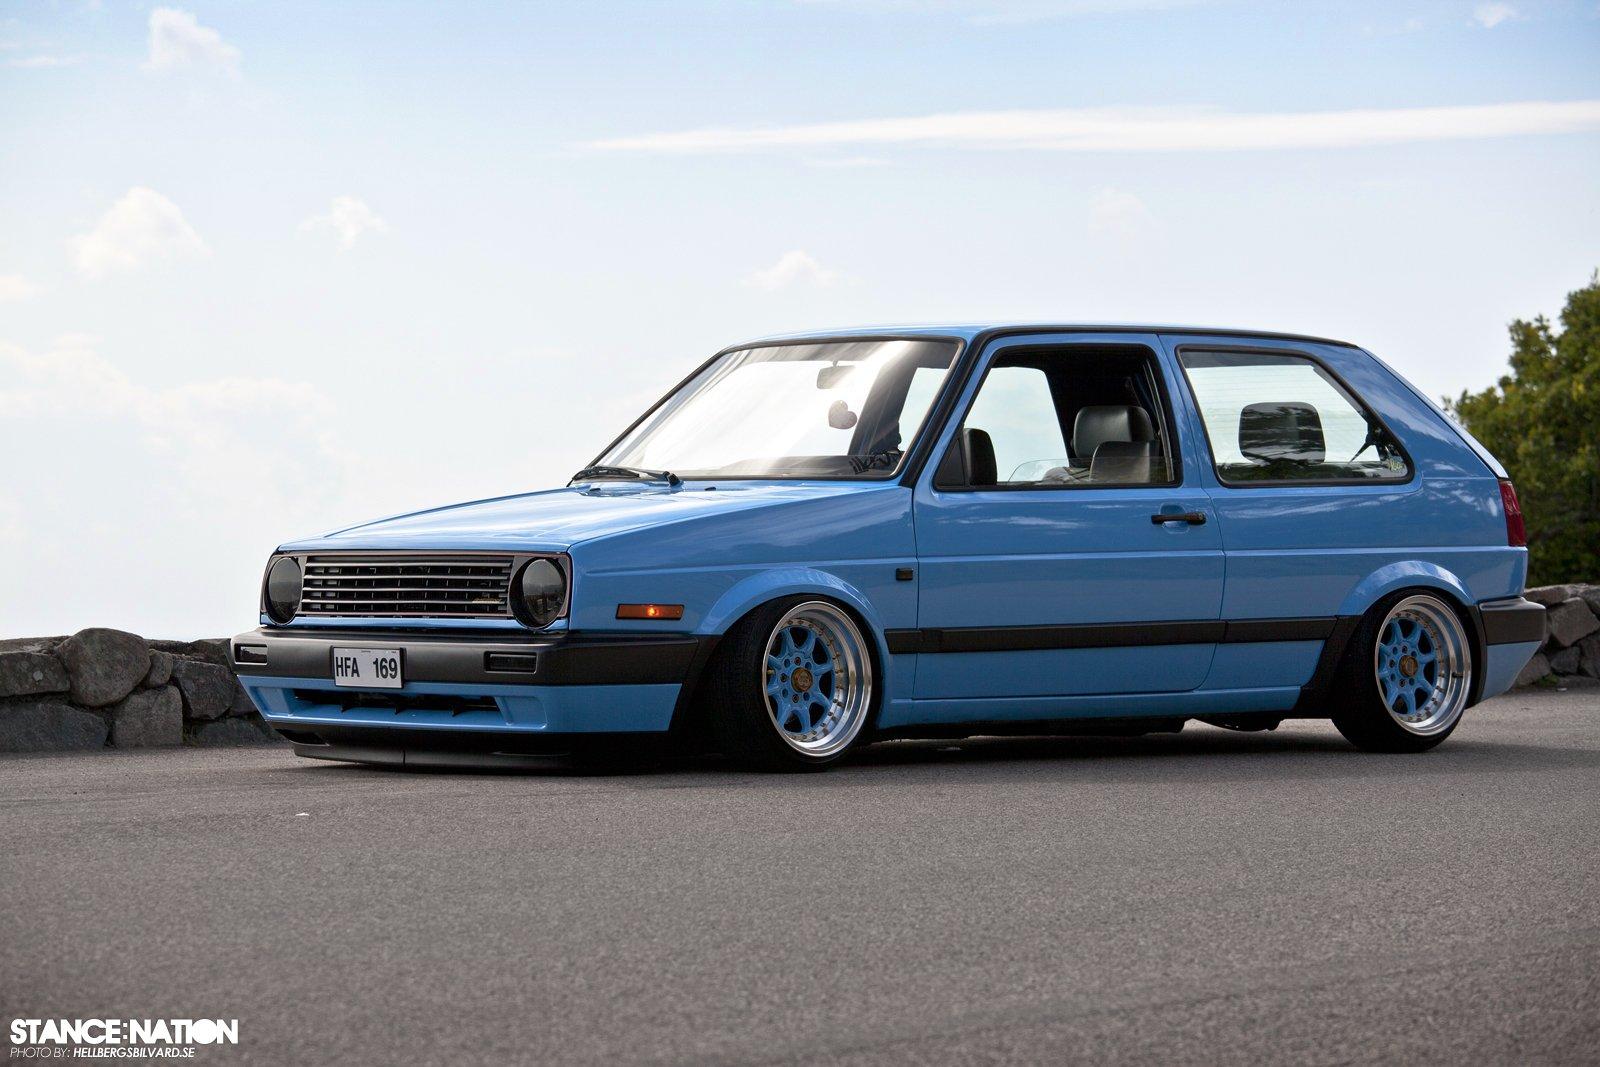 Jetta 3 For Sale >> Volkswagen Golf Mk2 tuning custom wallpaper | 1600x1067 | 847763 | WallpaperUP